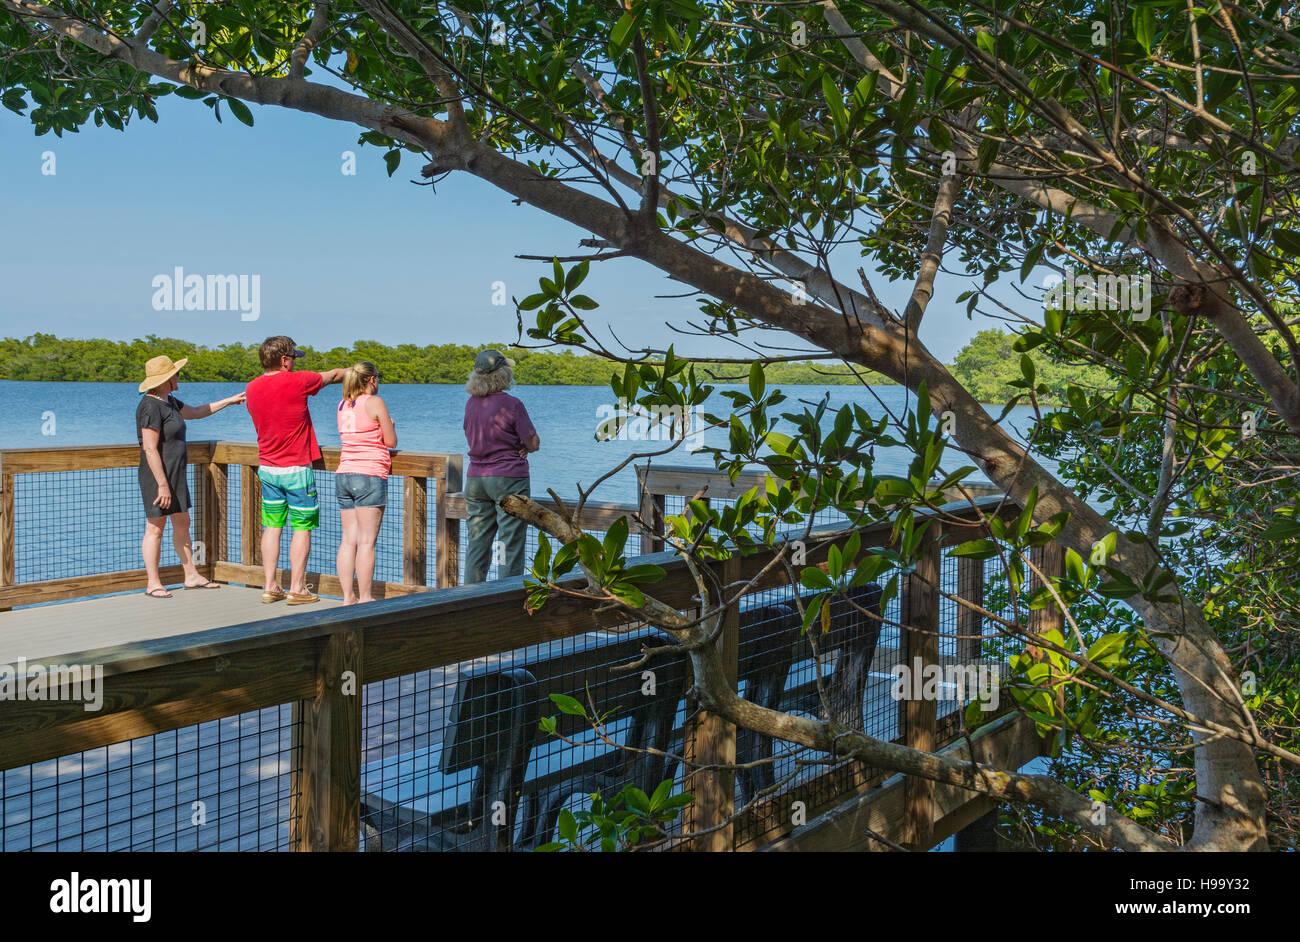 Florida, Sanibel Island, J.N. 'Ding' Darling National Wildlife Refuge, Wildlife Drive, Mangrove Overlook - Stock Image